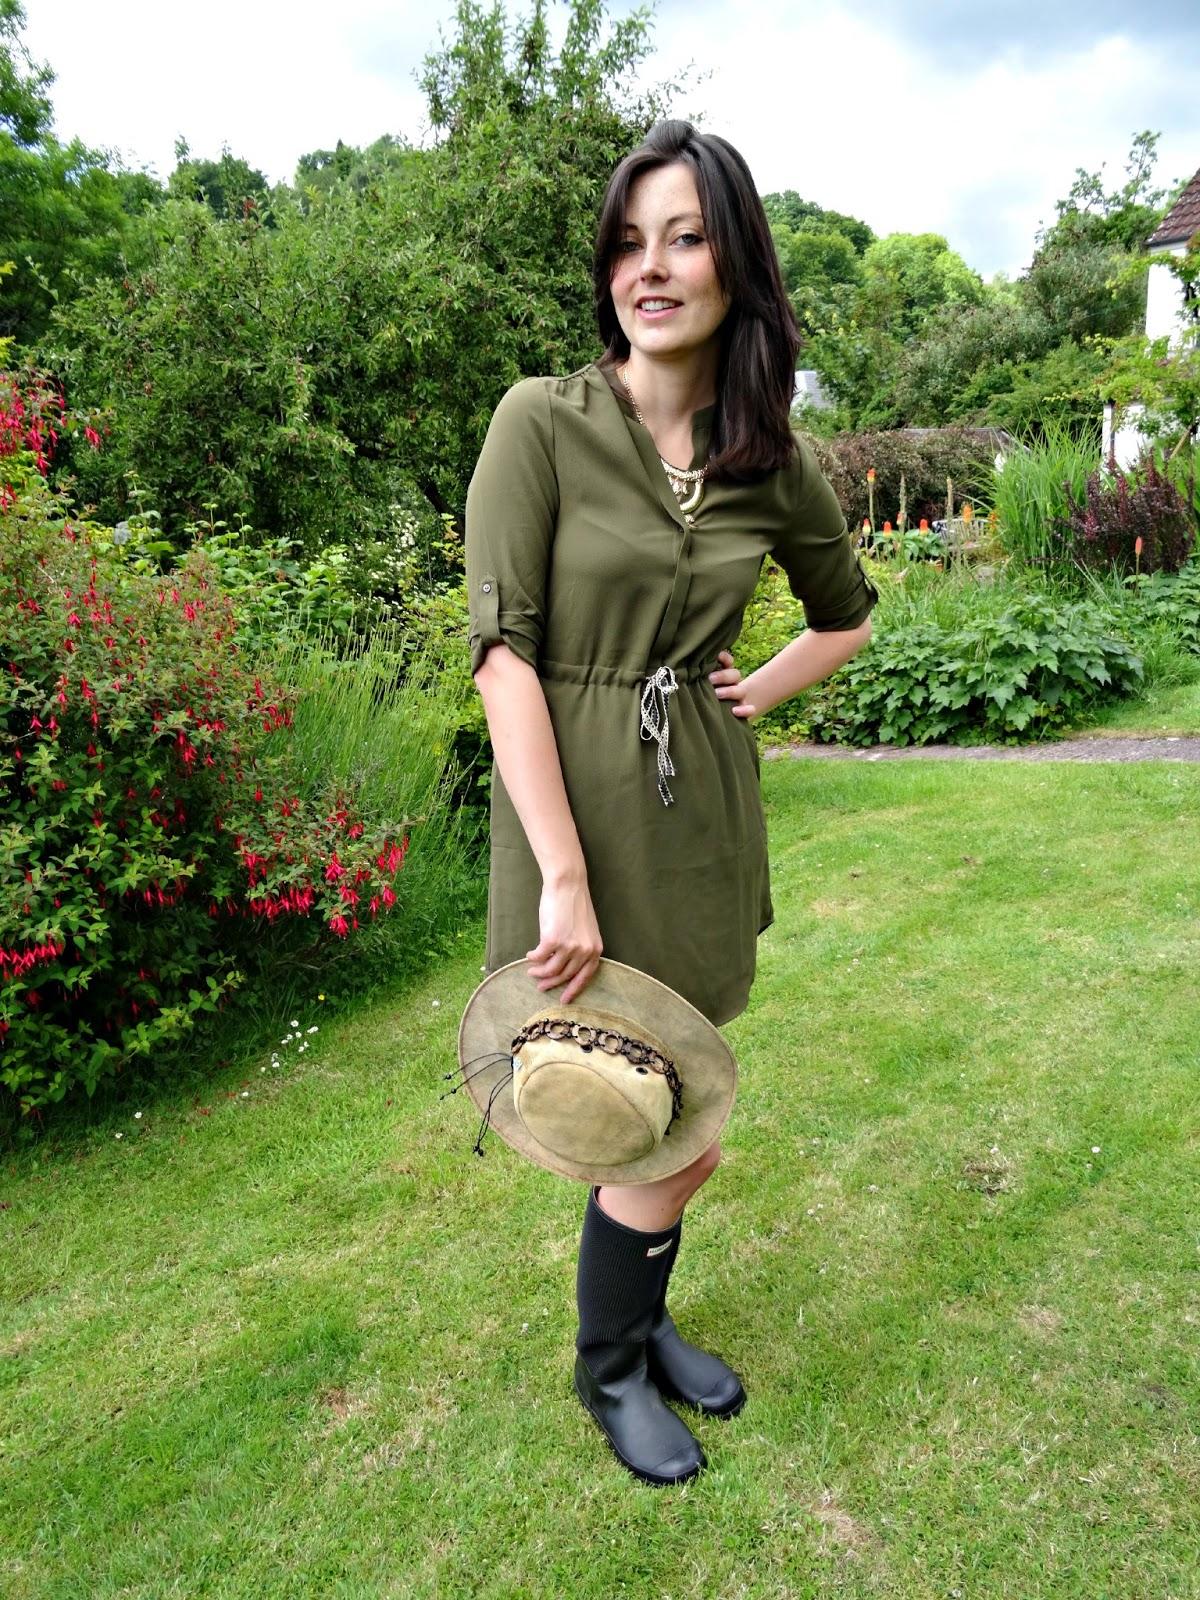 Glastonbury festival wear green coloured shirt dress